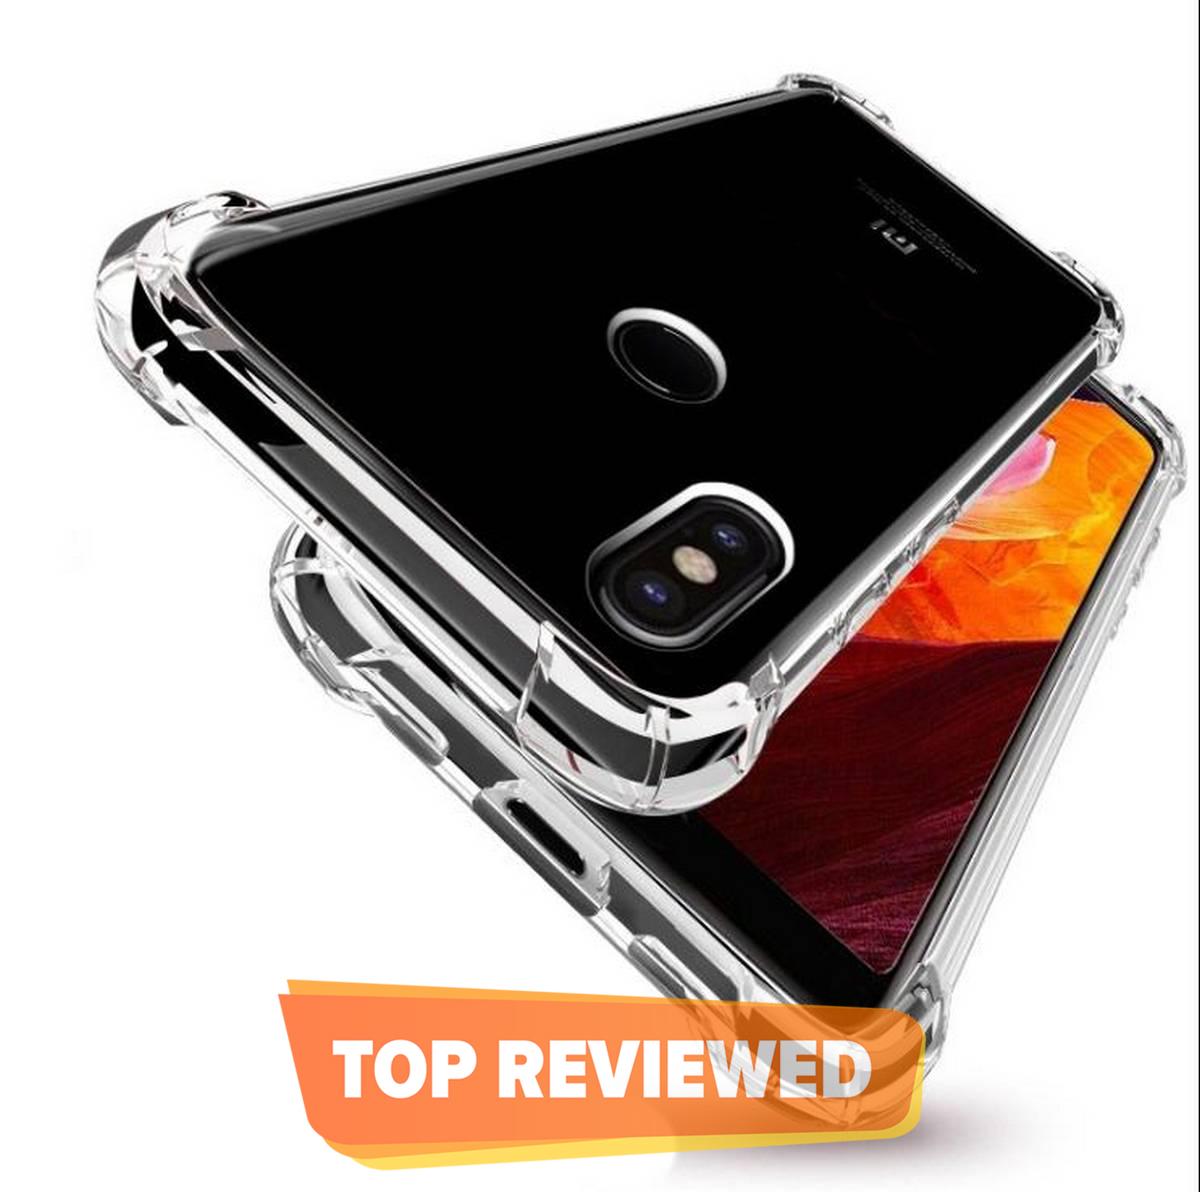 Xiaomi Redmi Note 5 Pro Antishock Drop Resistance Transparent Tpu Case Silicone Back Cover